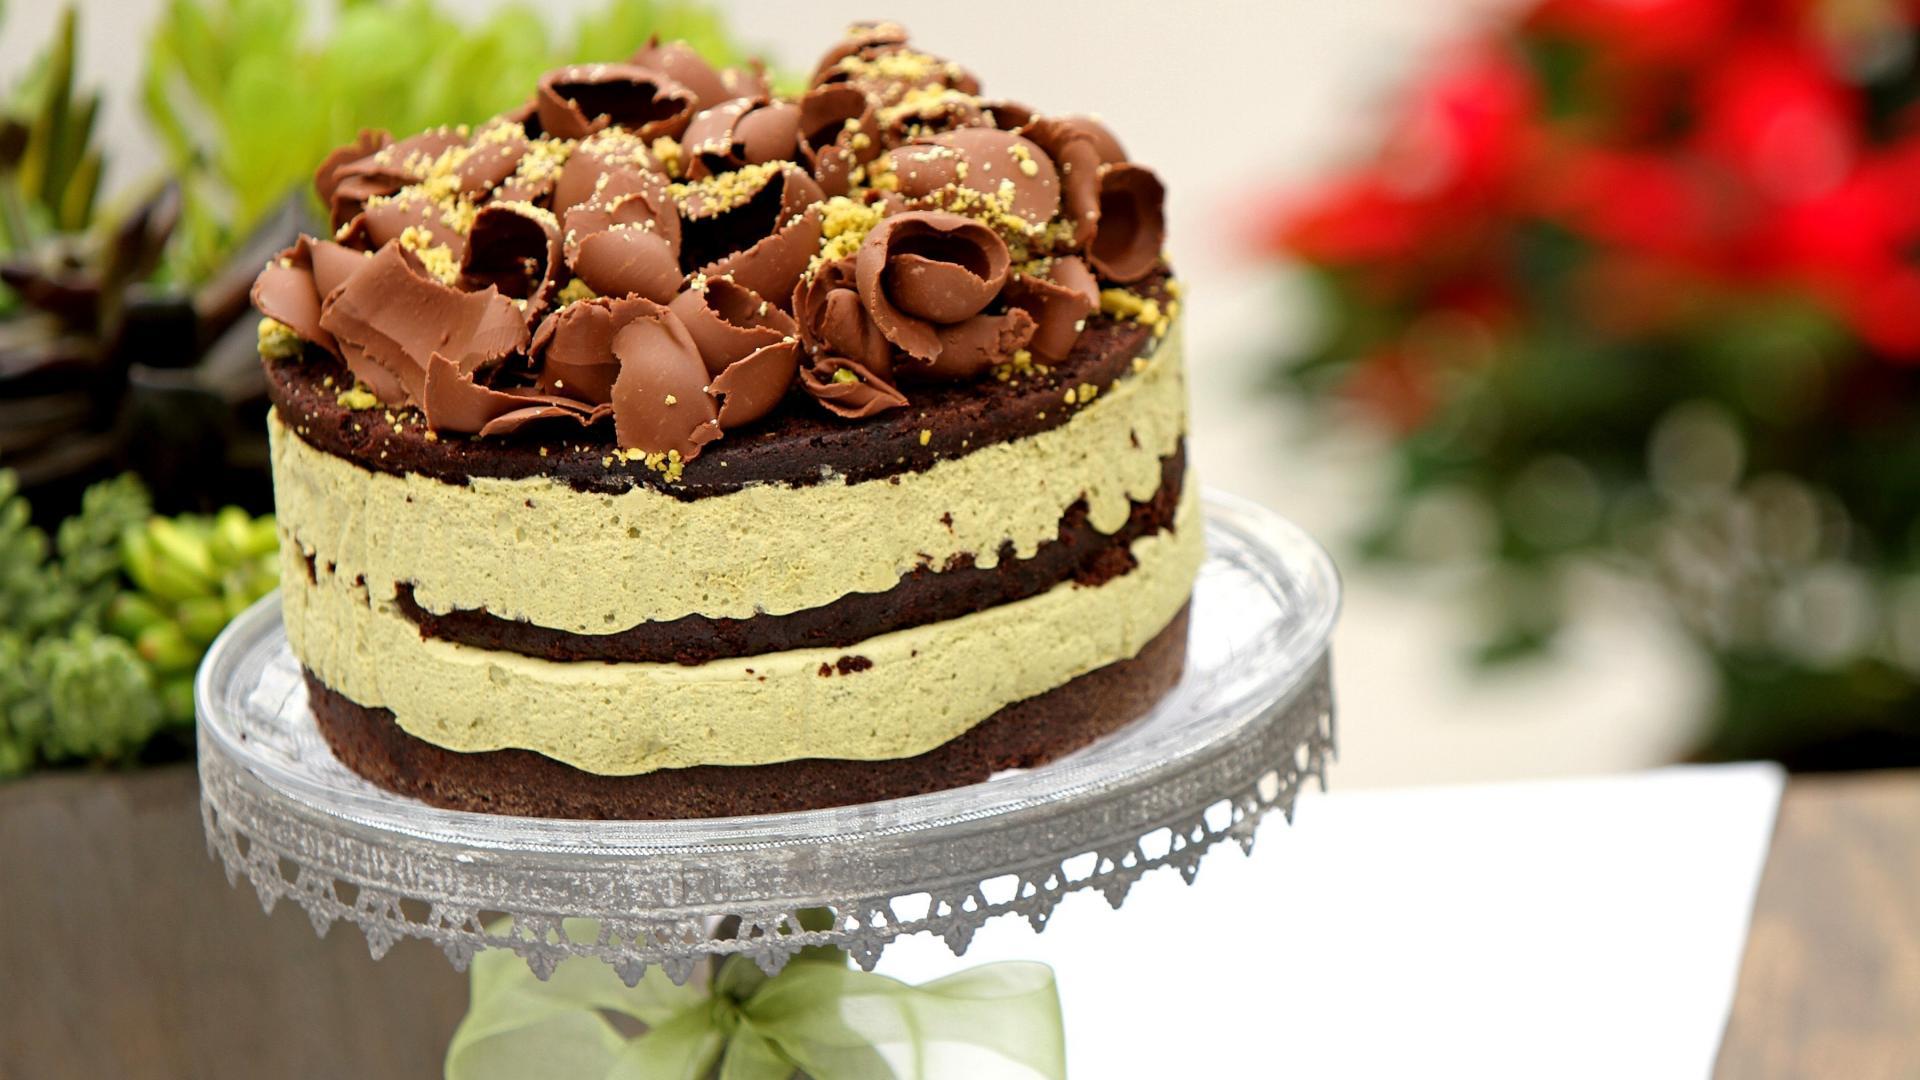 Birthday Cake Images Free Download Hd Cake 1920x1080